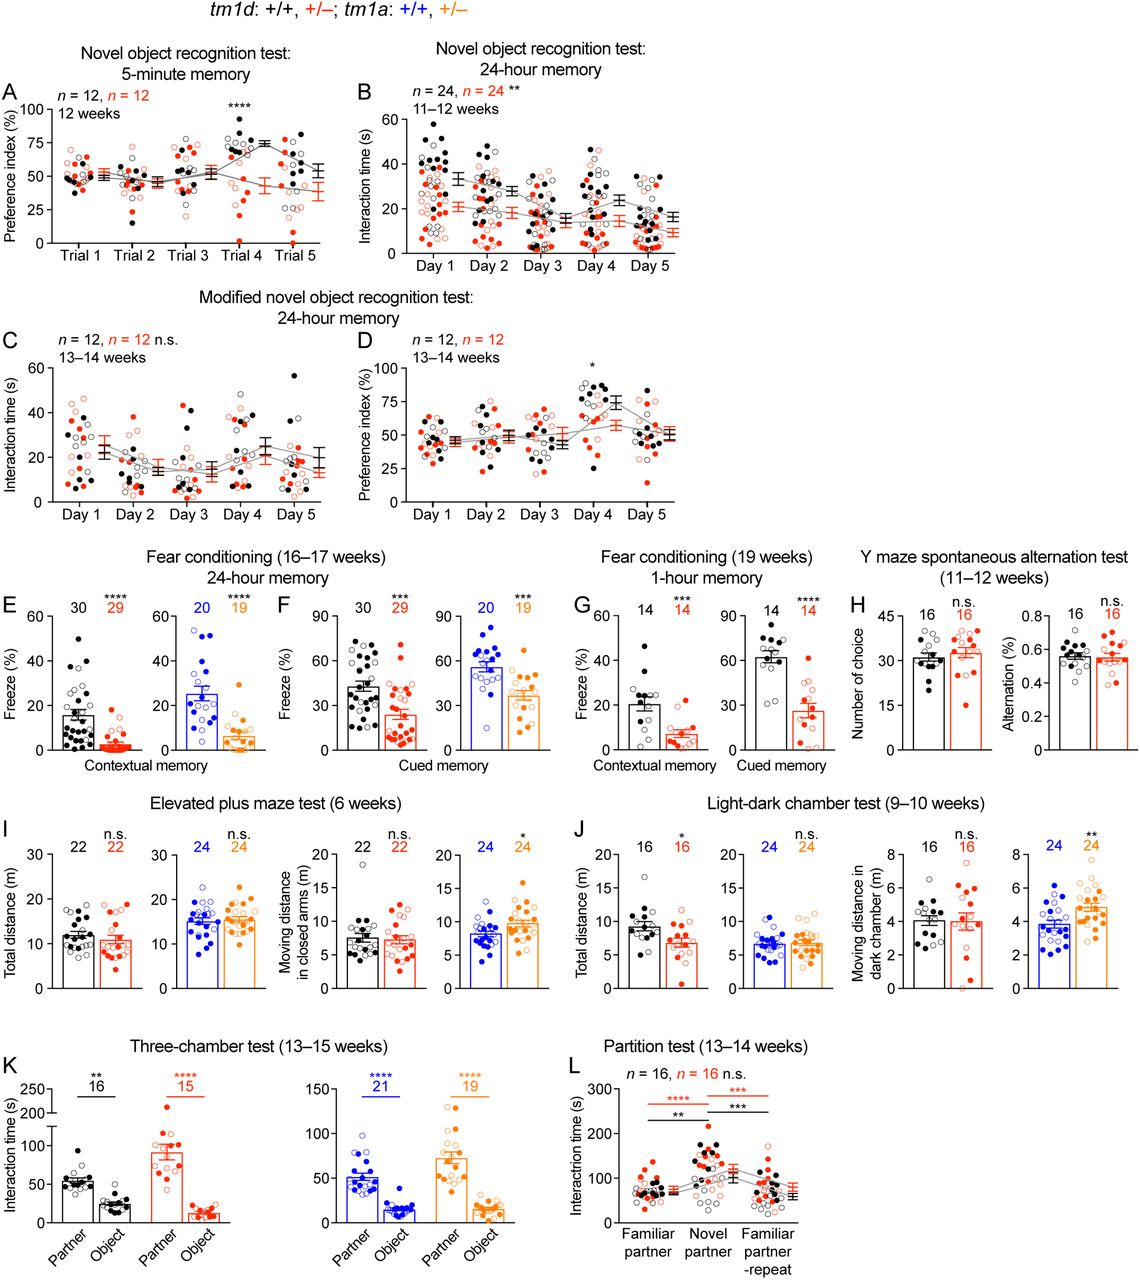 Stxbp1/Munc18-1 haploinsufficiency in mice recapitulates key